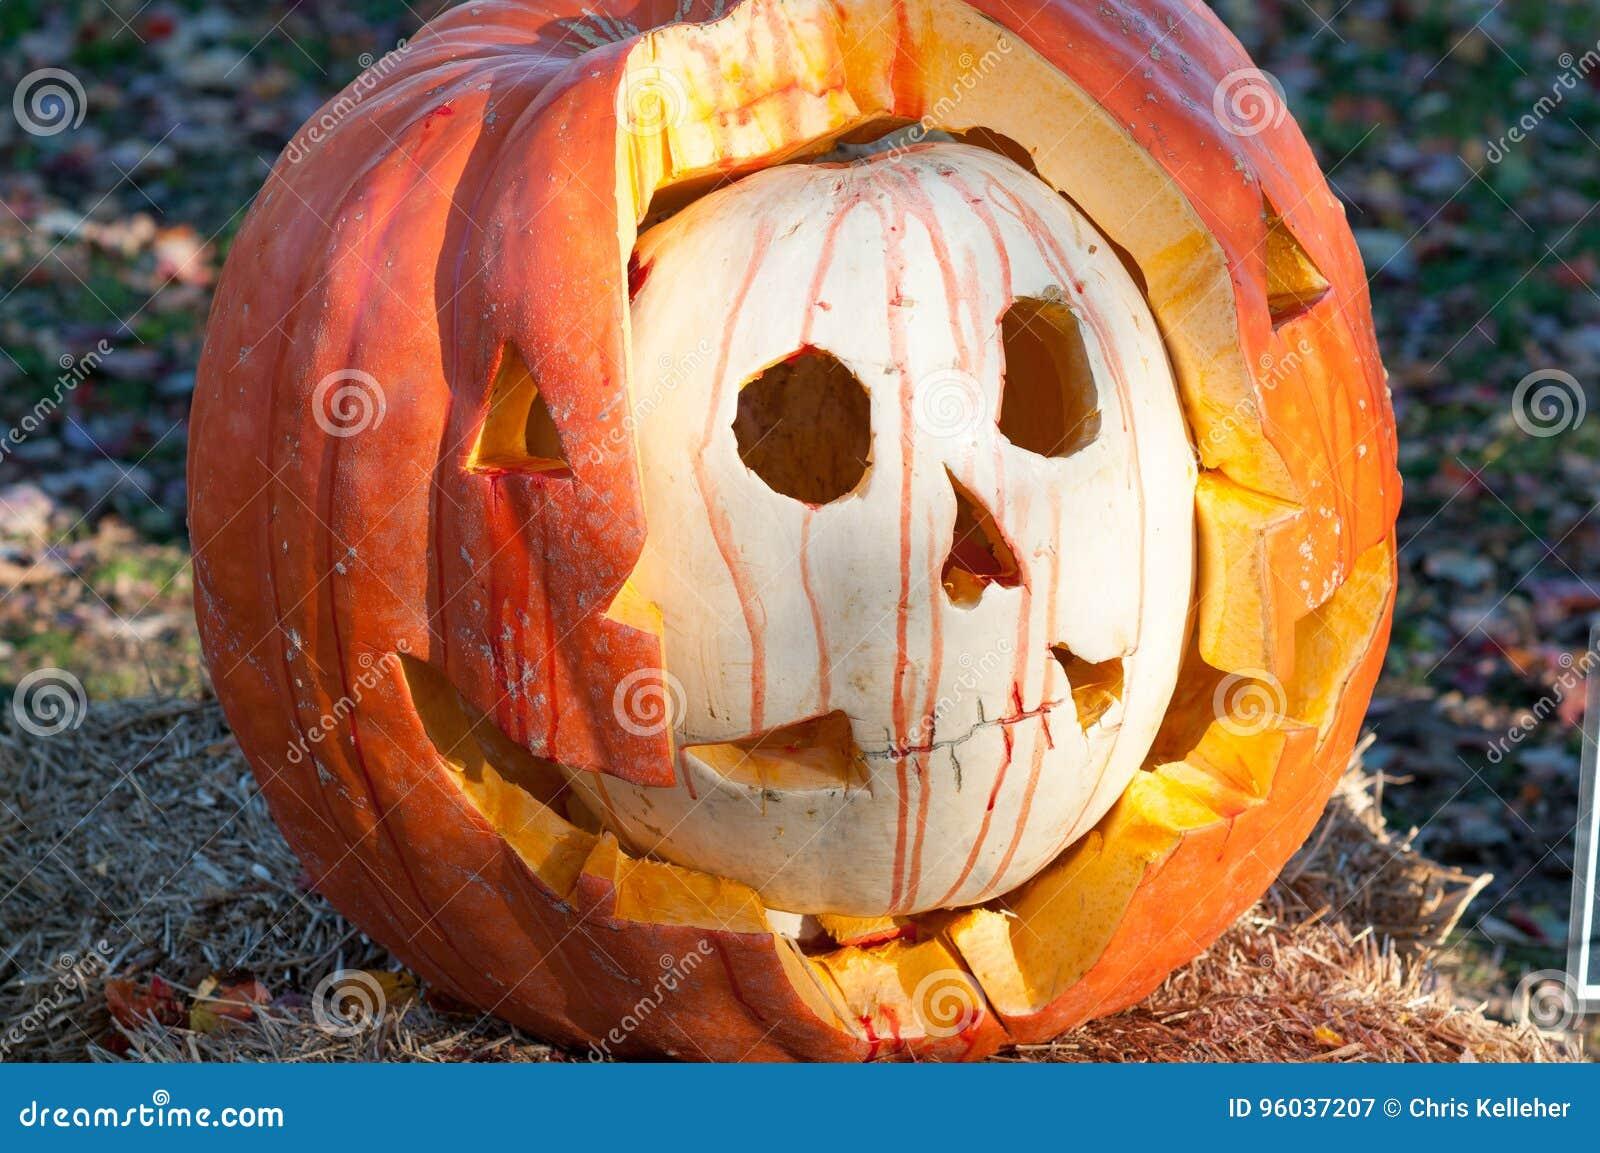 CHADDS福特, PA - 10月26日:伟大的南瓜雕刻2013年10月26日的Carve比赛